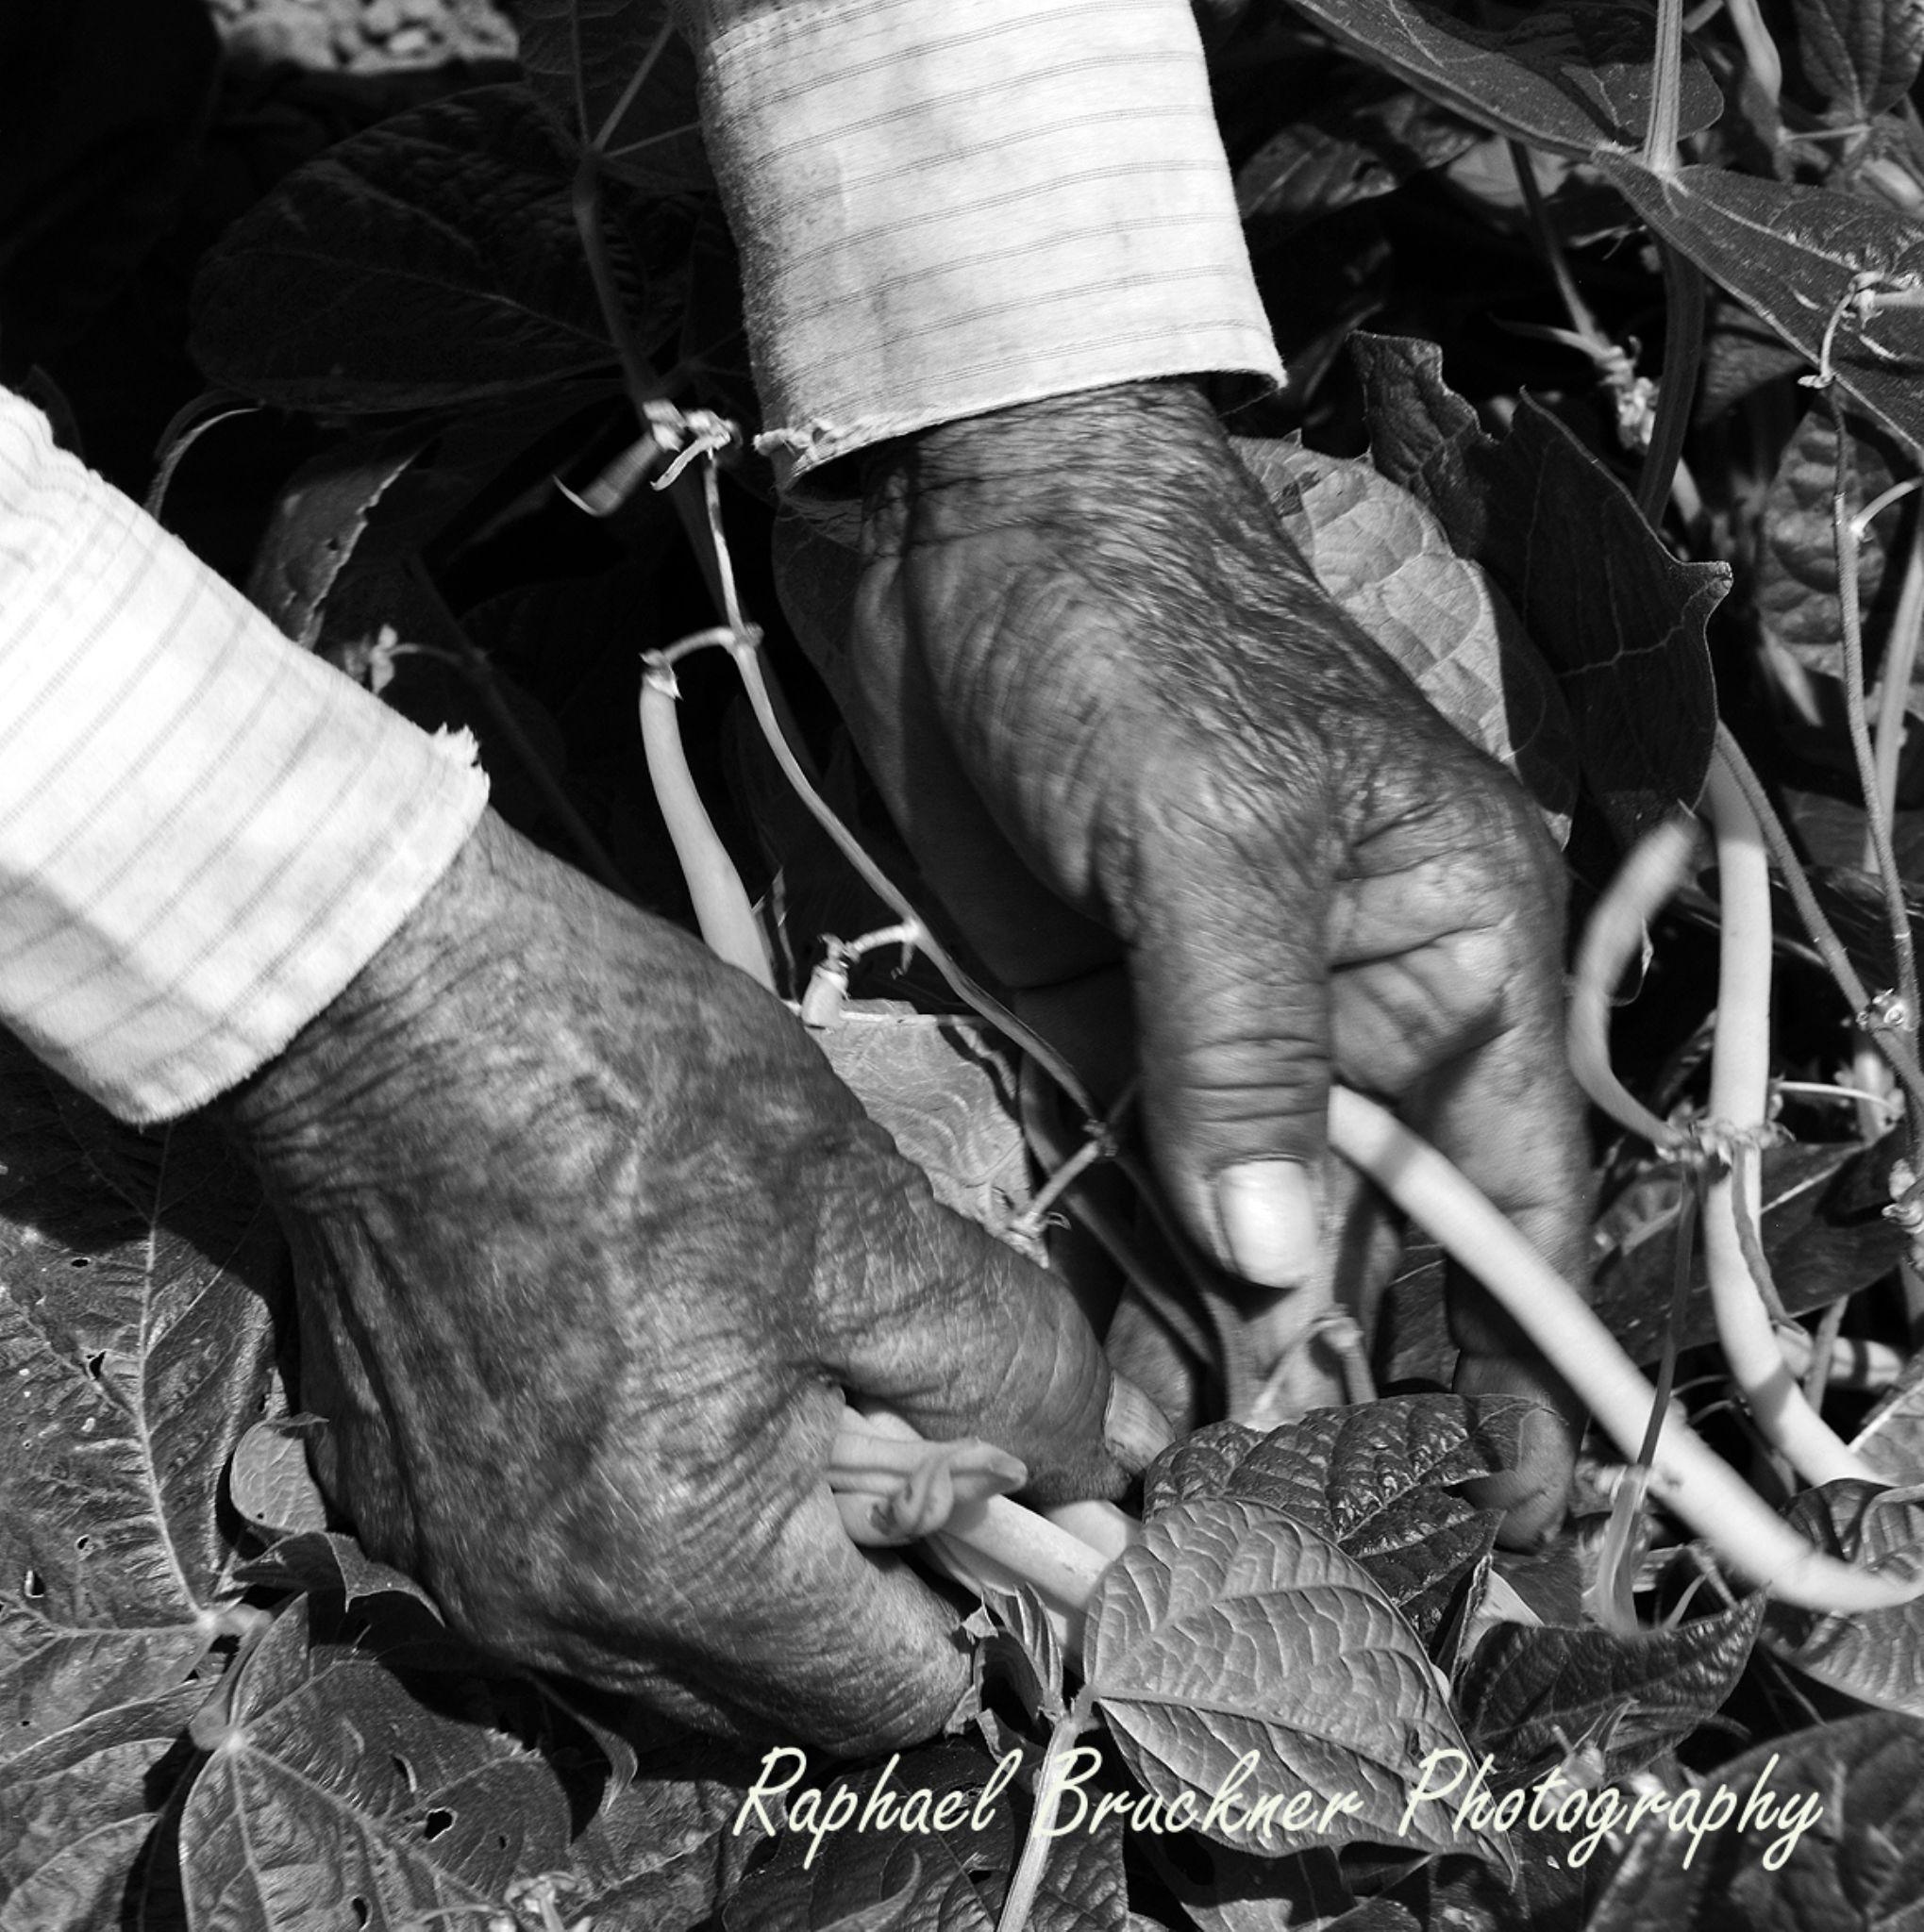 Hands Picking Beans by Raphael Bruckner Photography